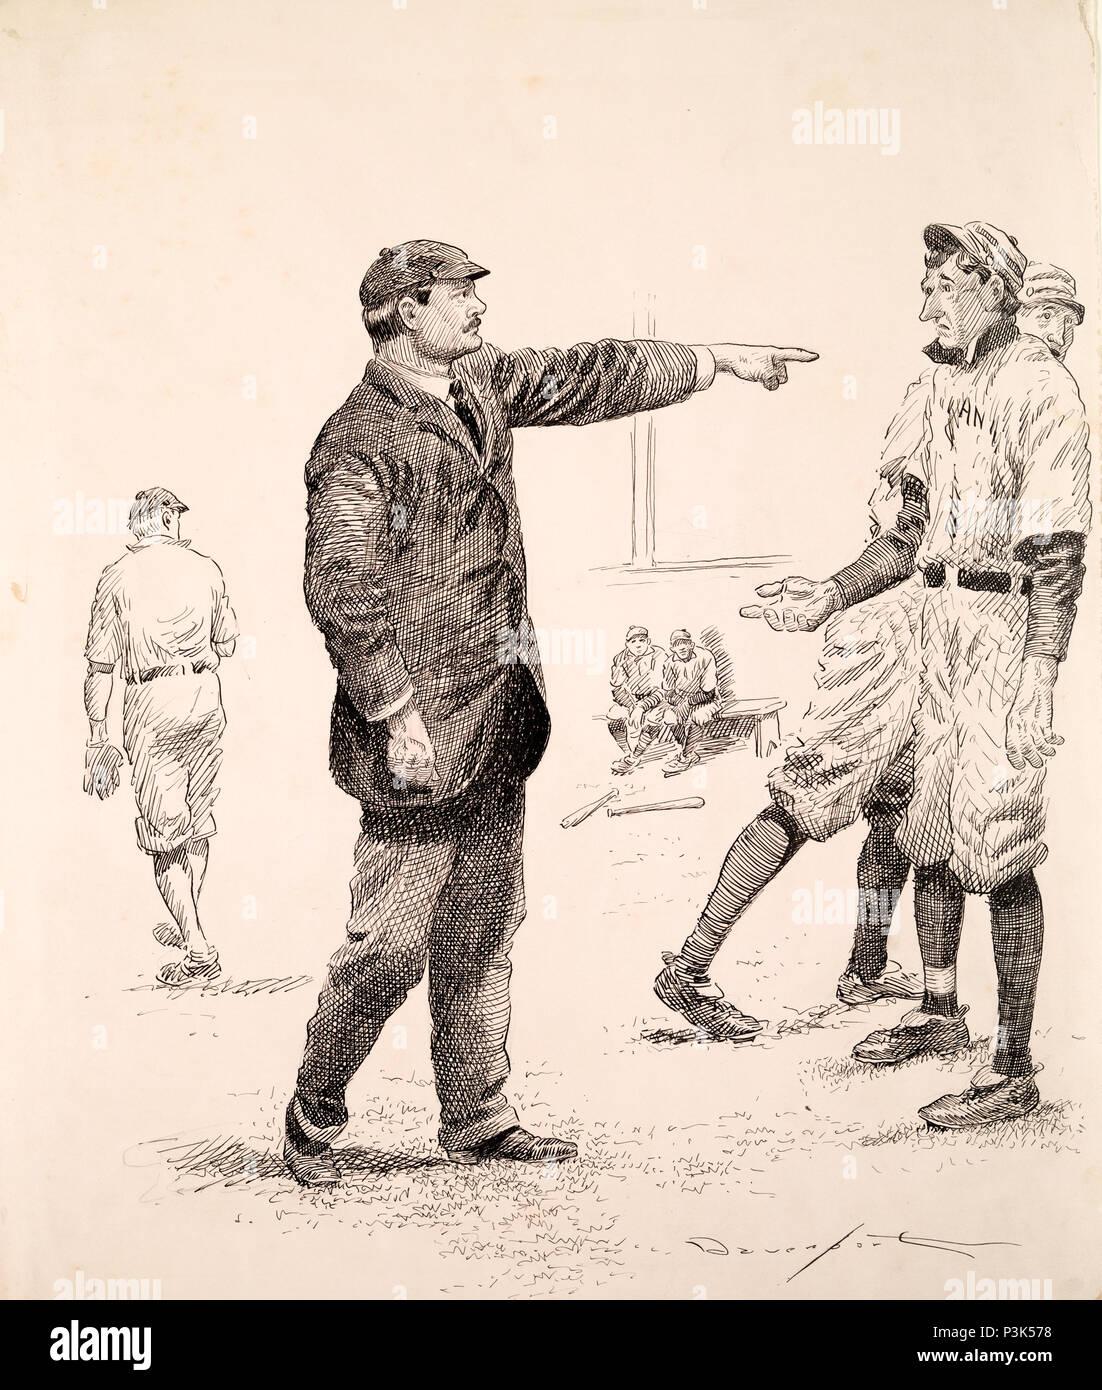 Baseball Umpire - Stock Image